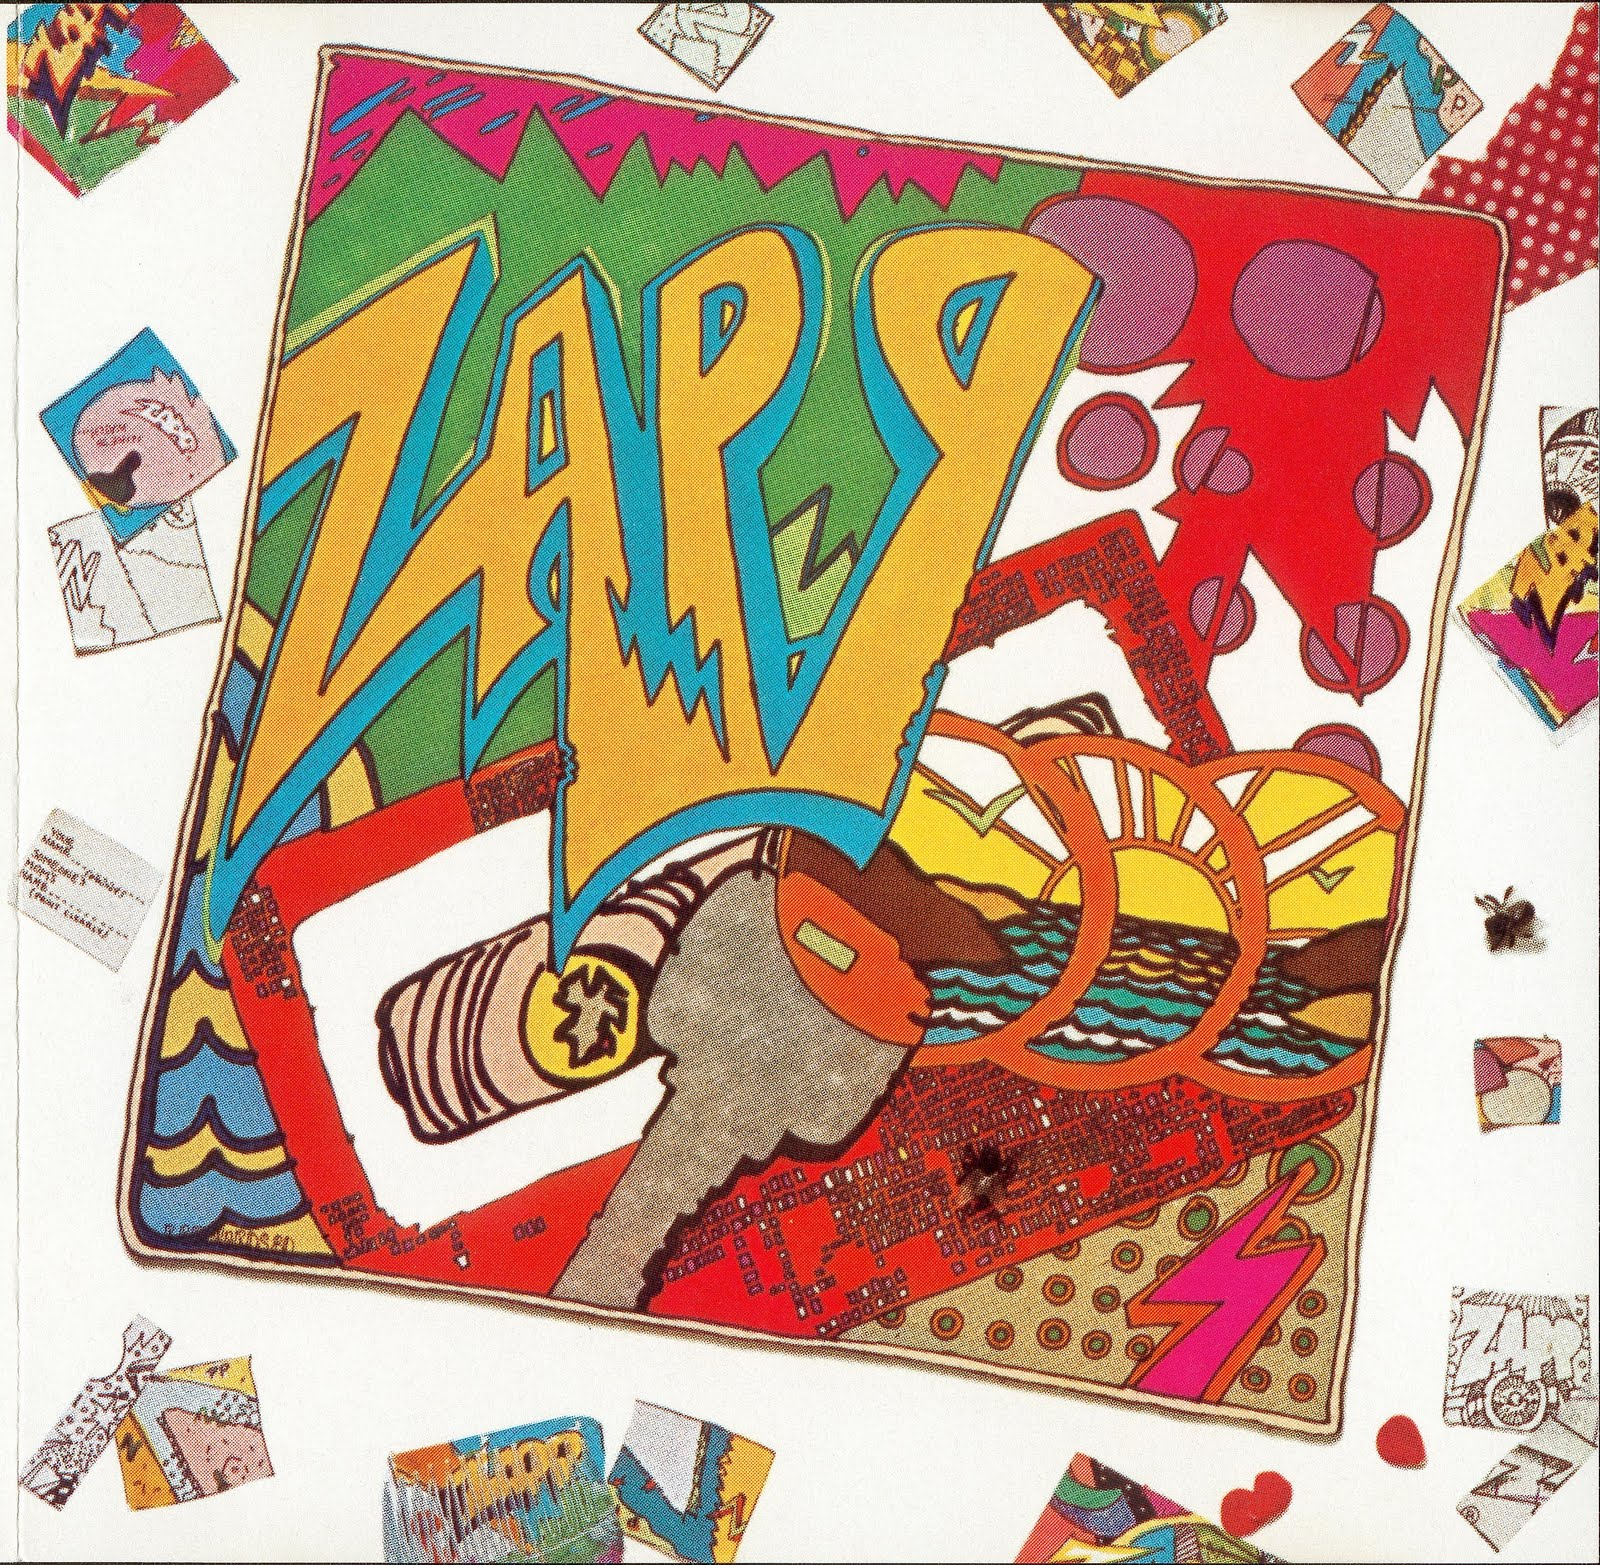 Roger Troutman Amp Zapp Funk